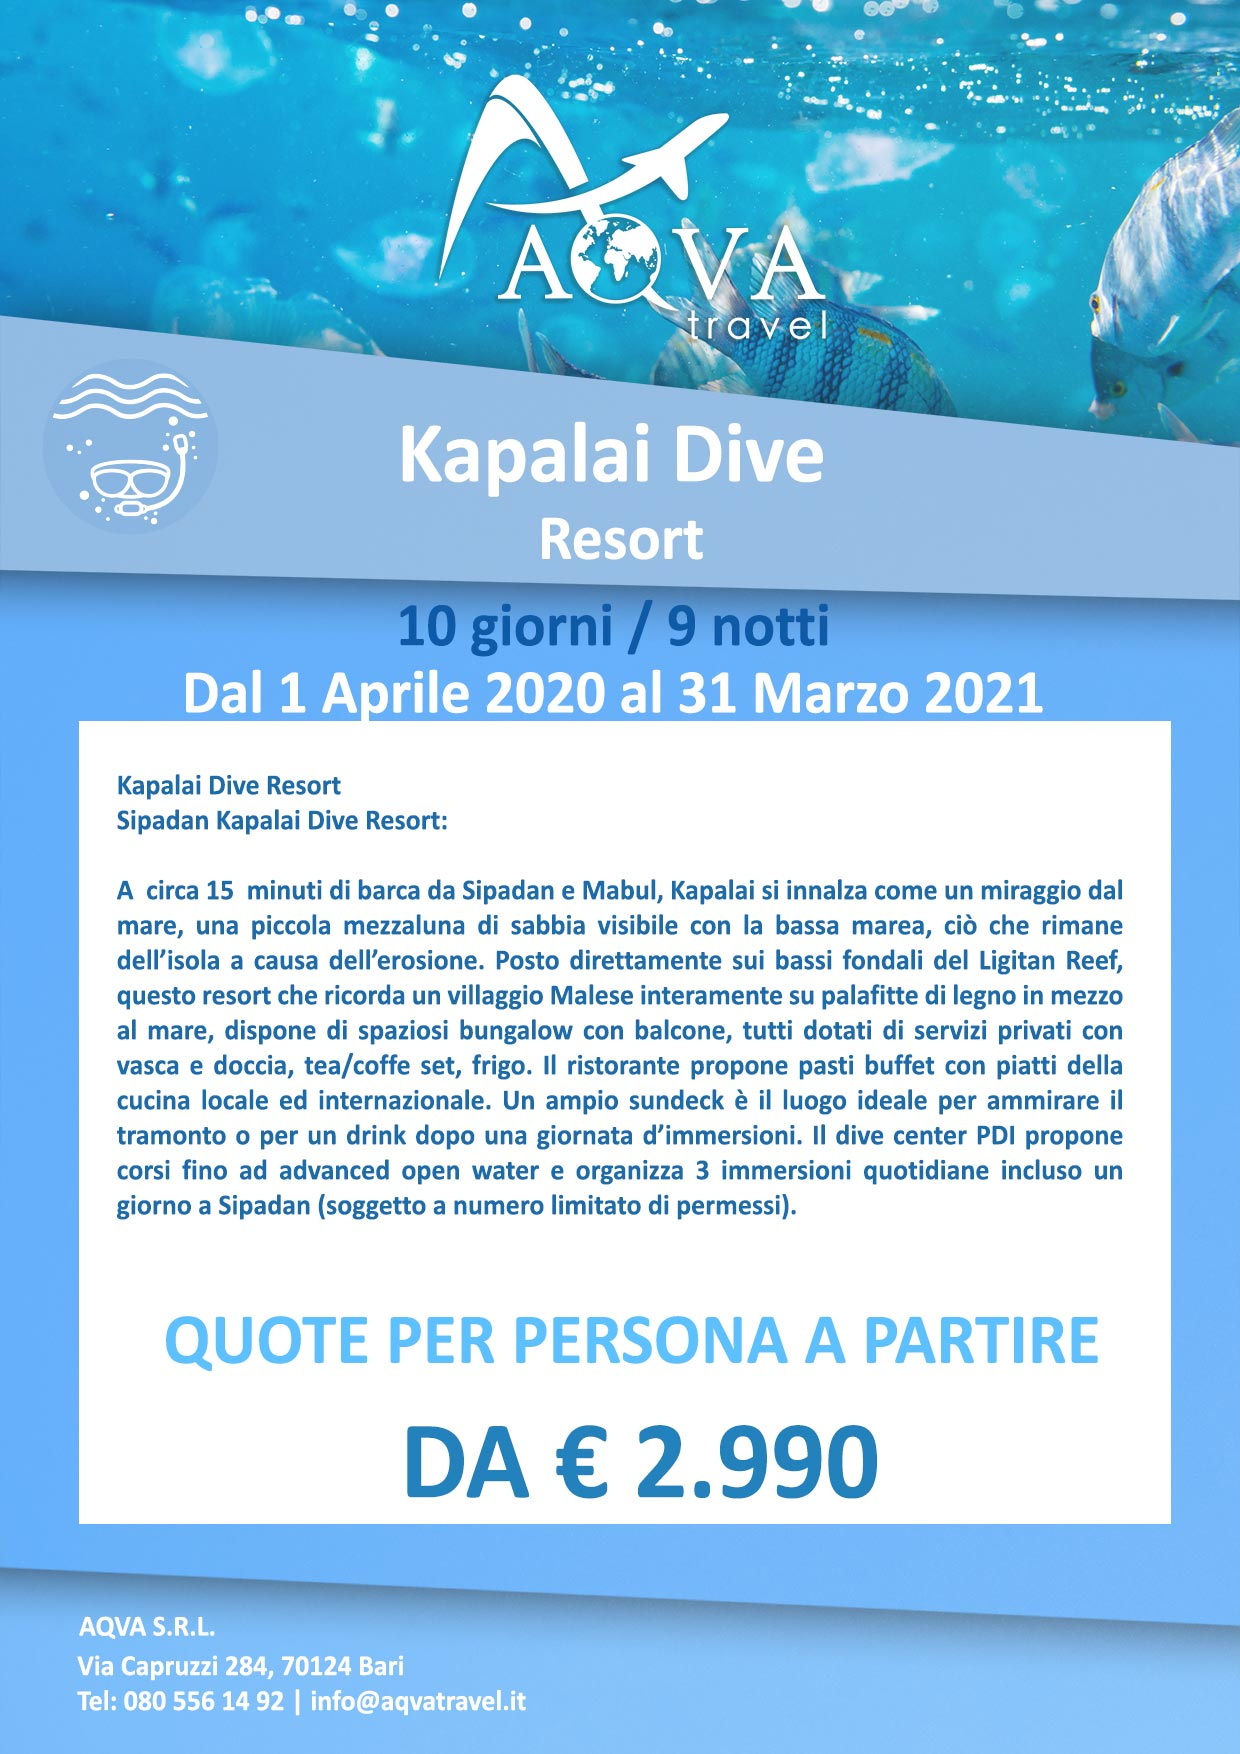 Subacquea-Kapalai-Dive-Resort-subacquea-offerte-agenzia-di-viaggi-Bari-AQVATRAVEL-it